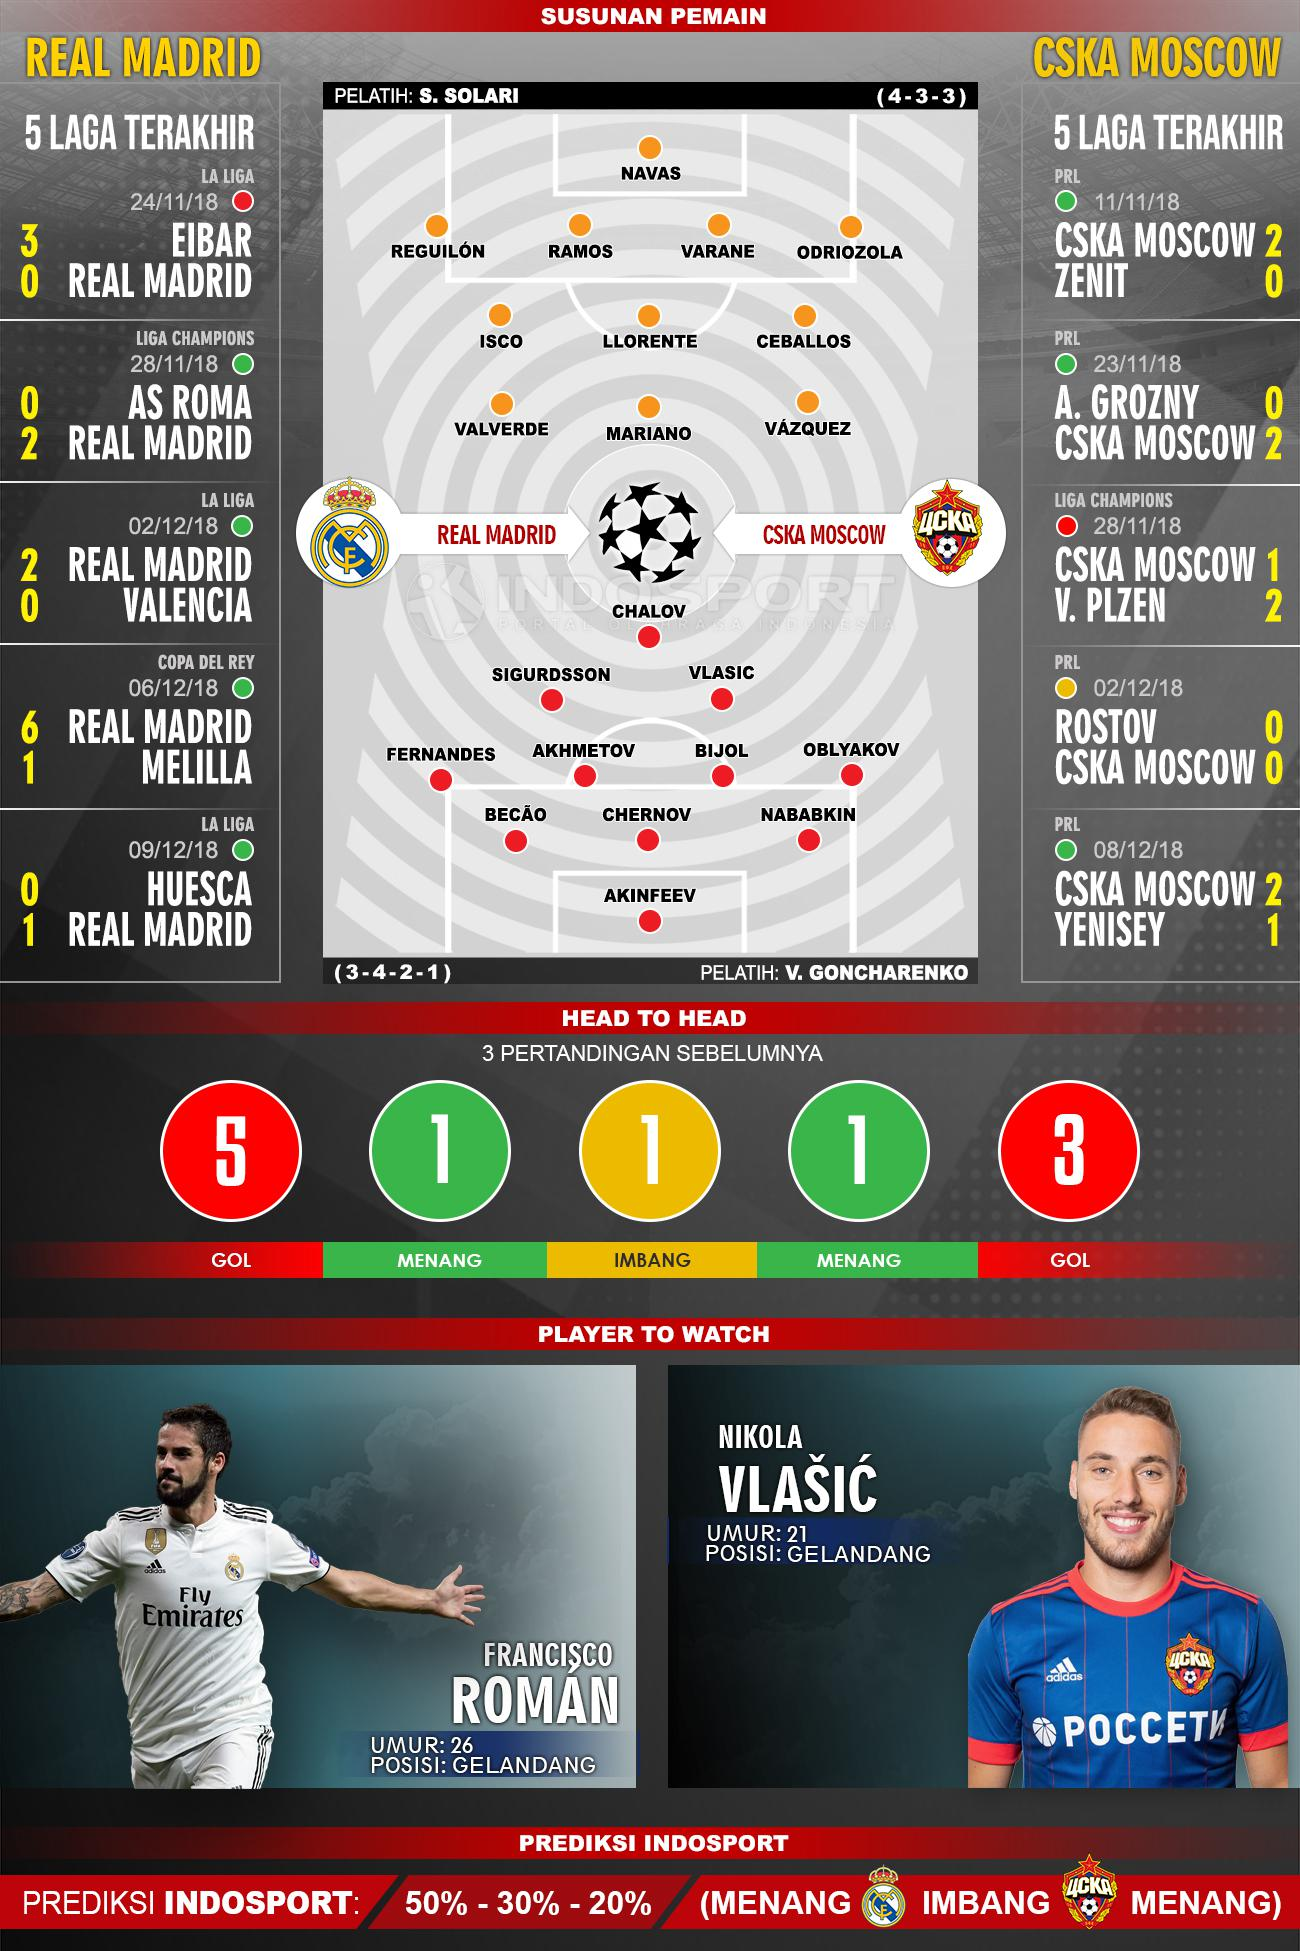 Susunan Pemain dan Lima Laga Terakhir Real Madrid vs CSKA Moscow Copyright: Indosport / Muhammad Fikri Sahara